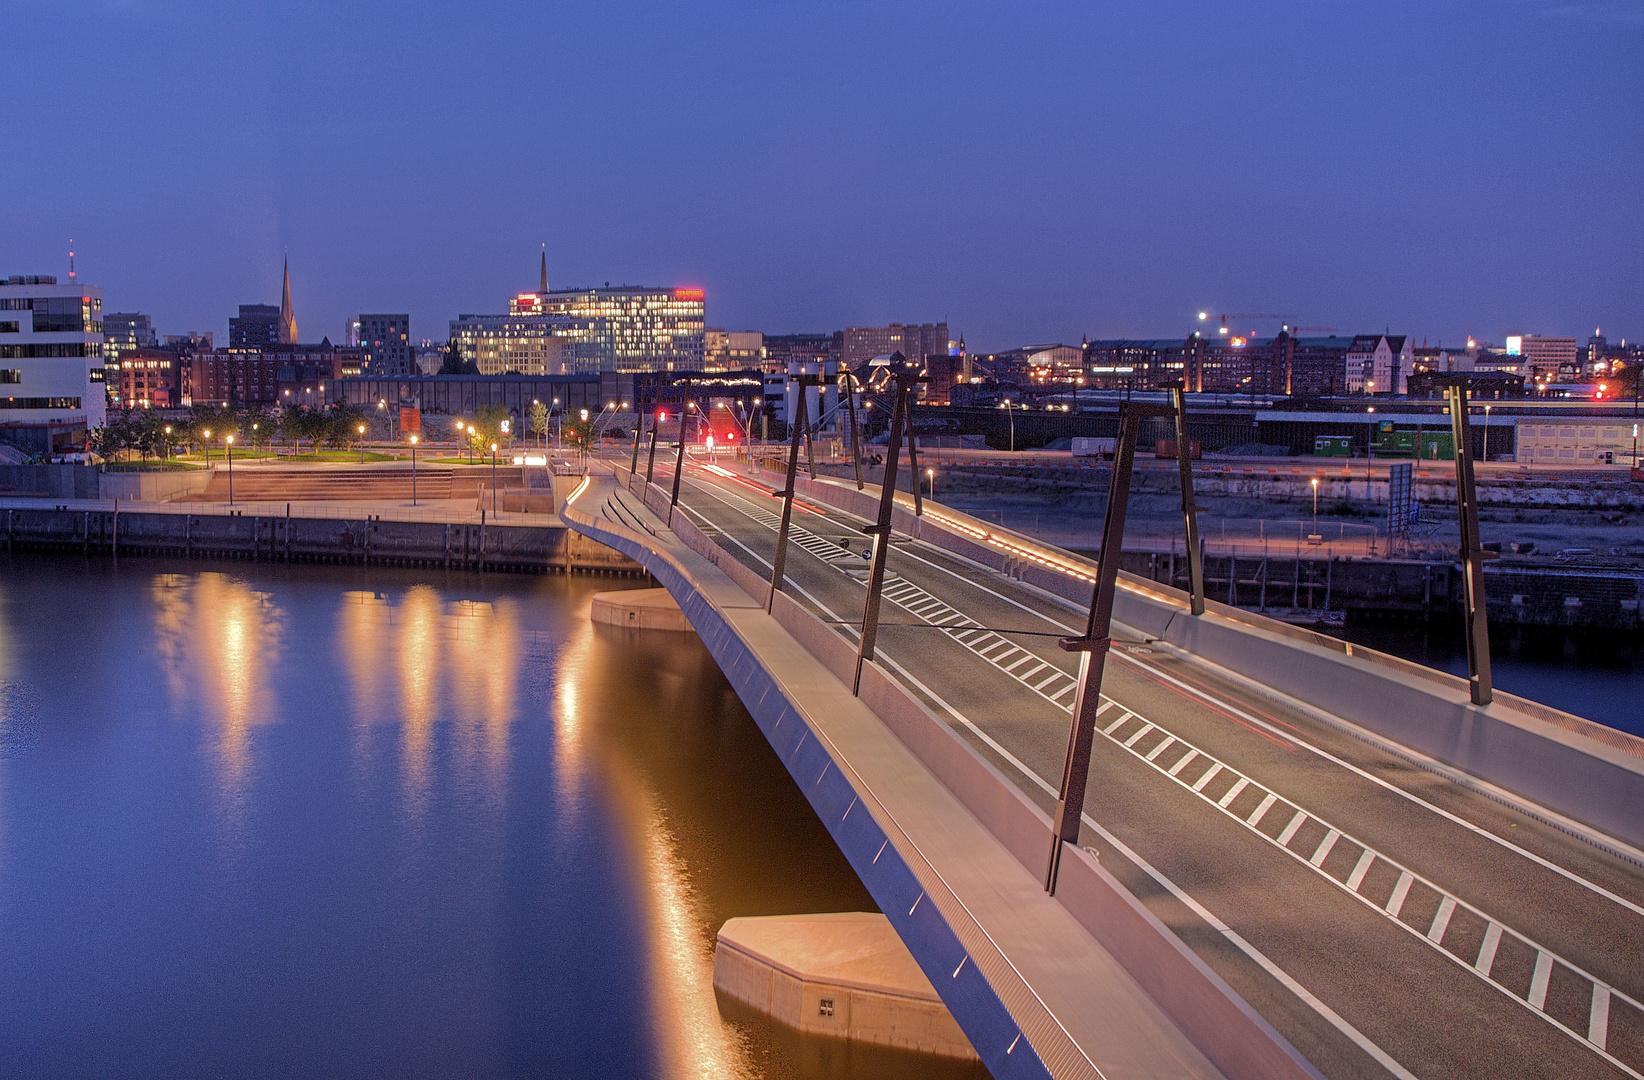 # Baaken-Brücke #